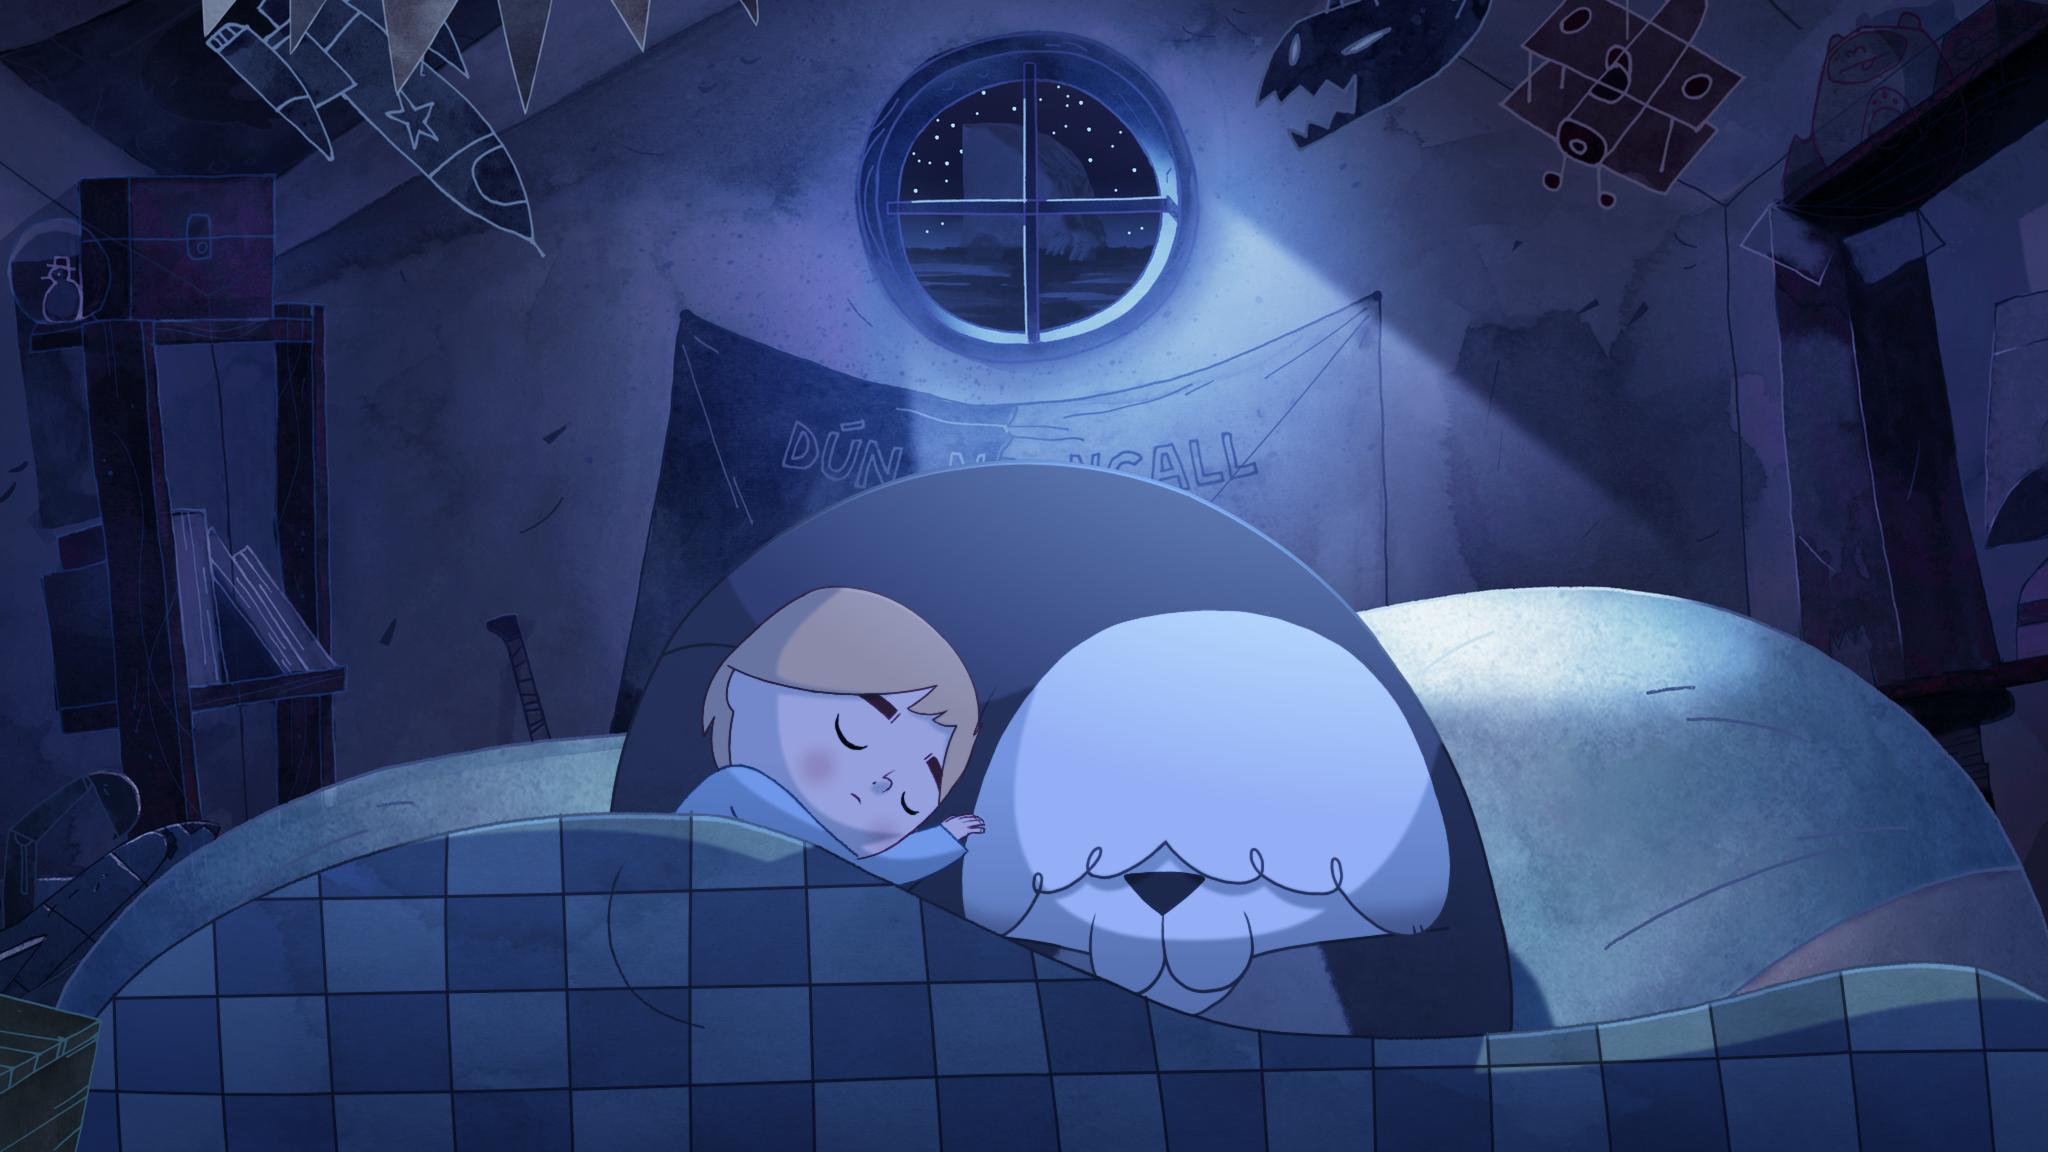 19_SOS_34_sleeping at night